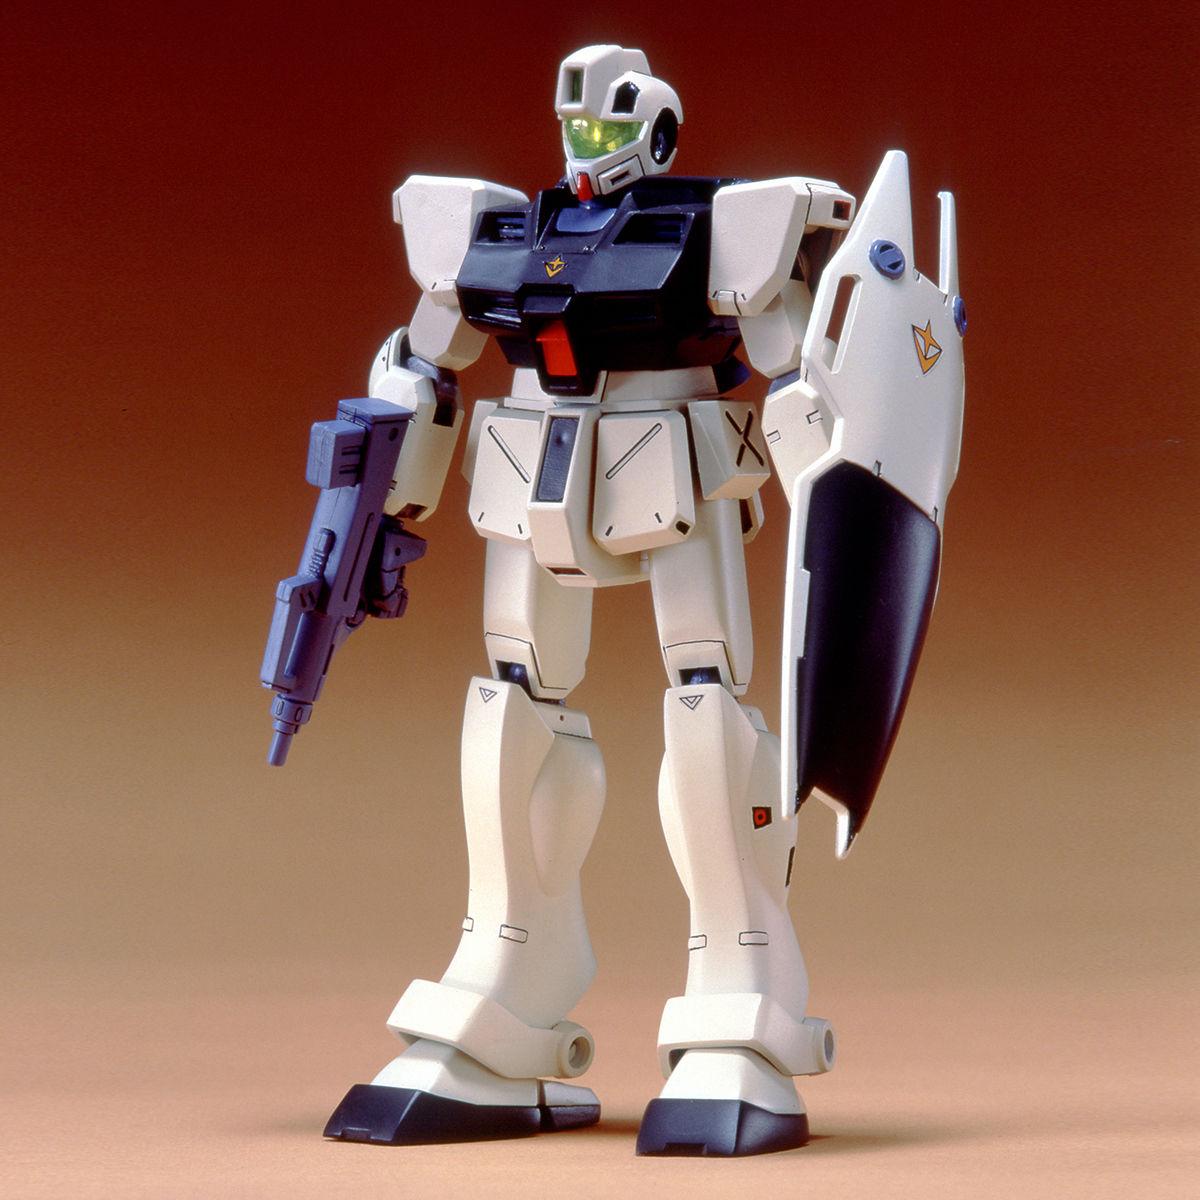 1/144 RGM-79G ジム・コマンド [GM Command]